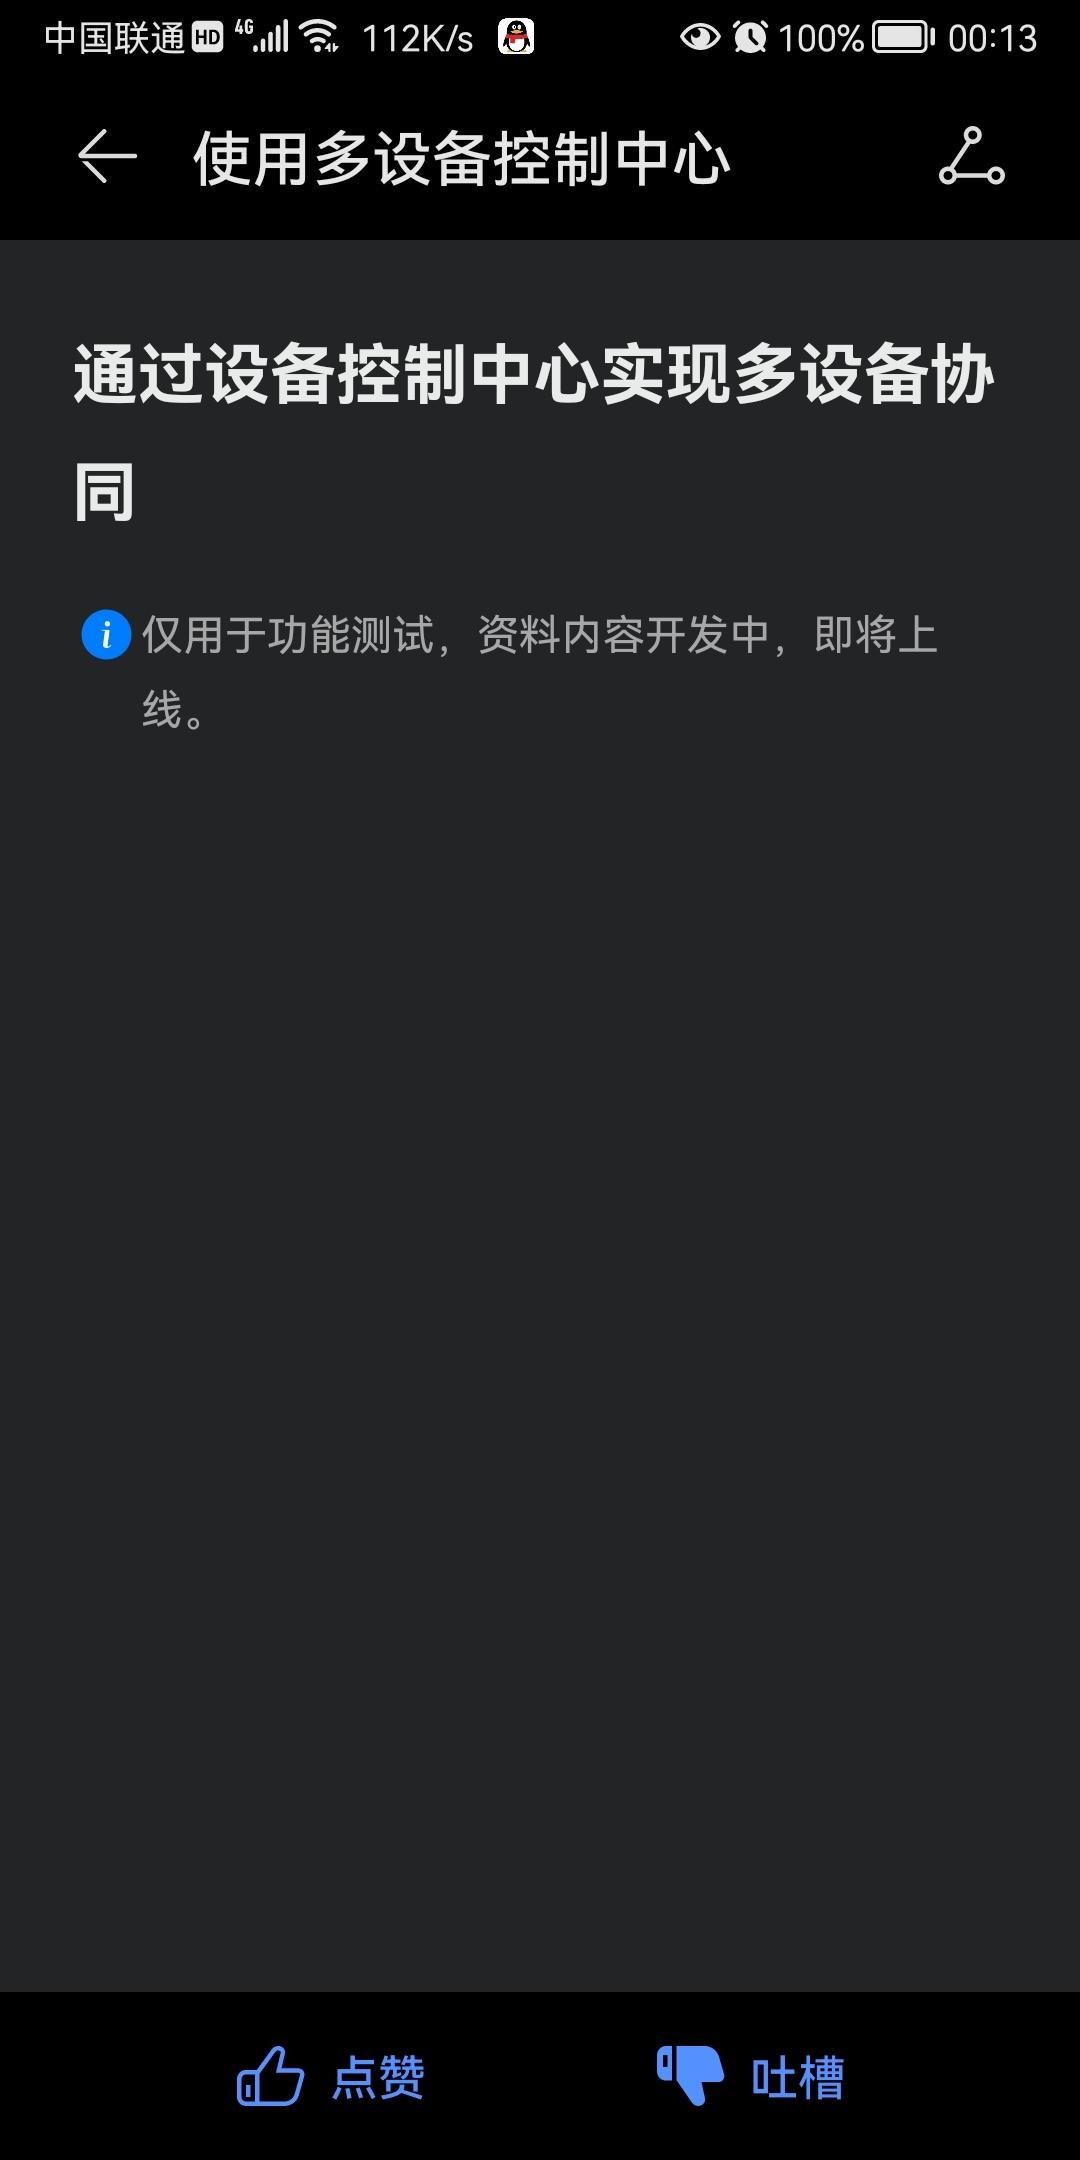 Screenshot_20210830_001349_com.huawei.android.tips.jpg